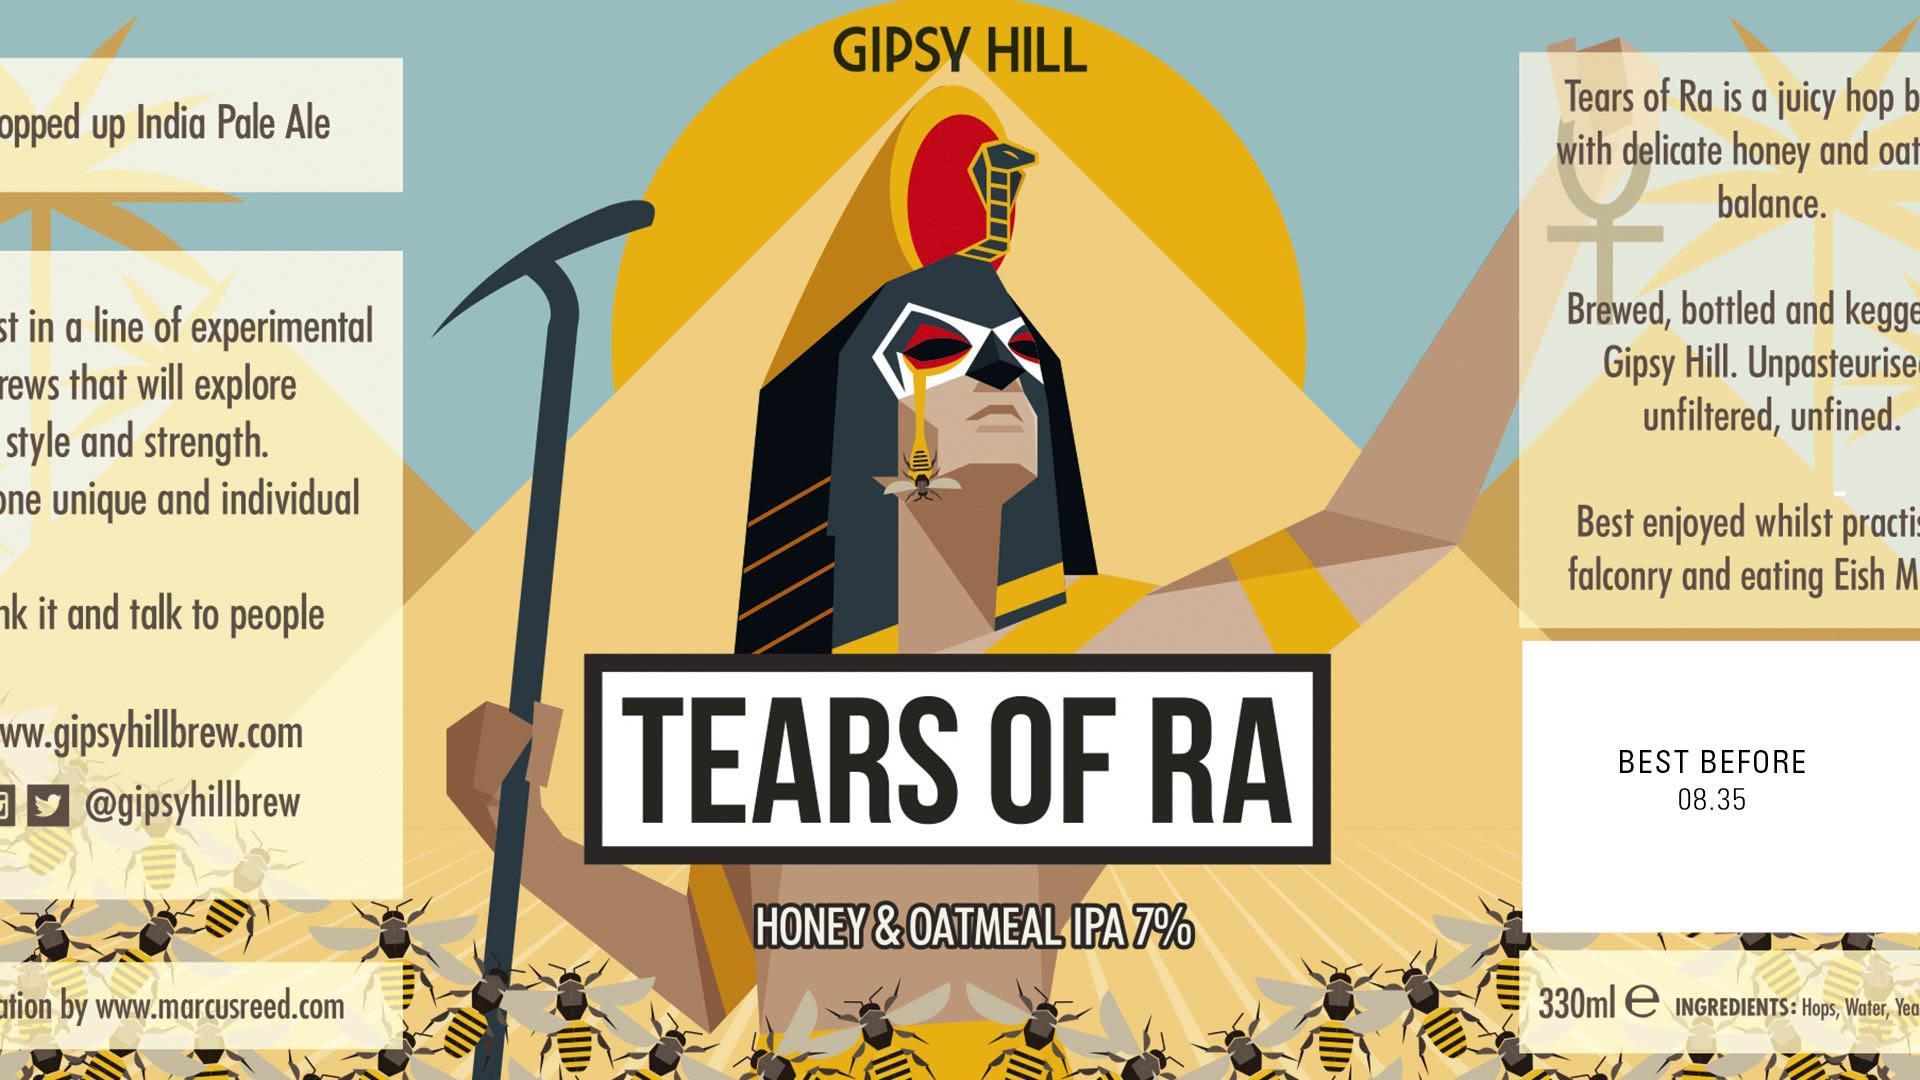 Gipsy Hill's striking label designs